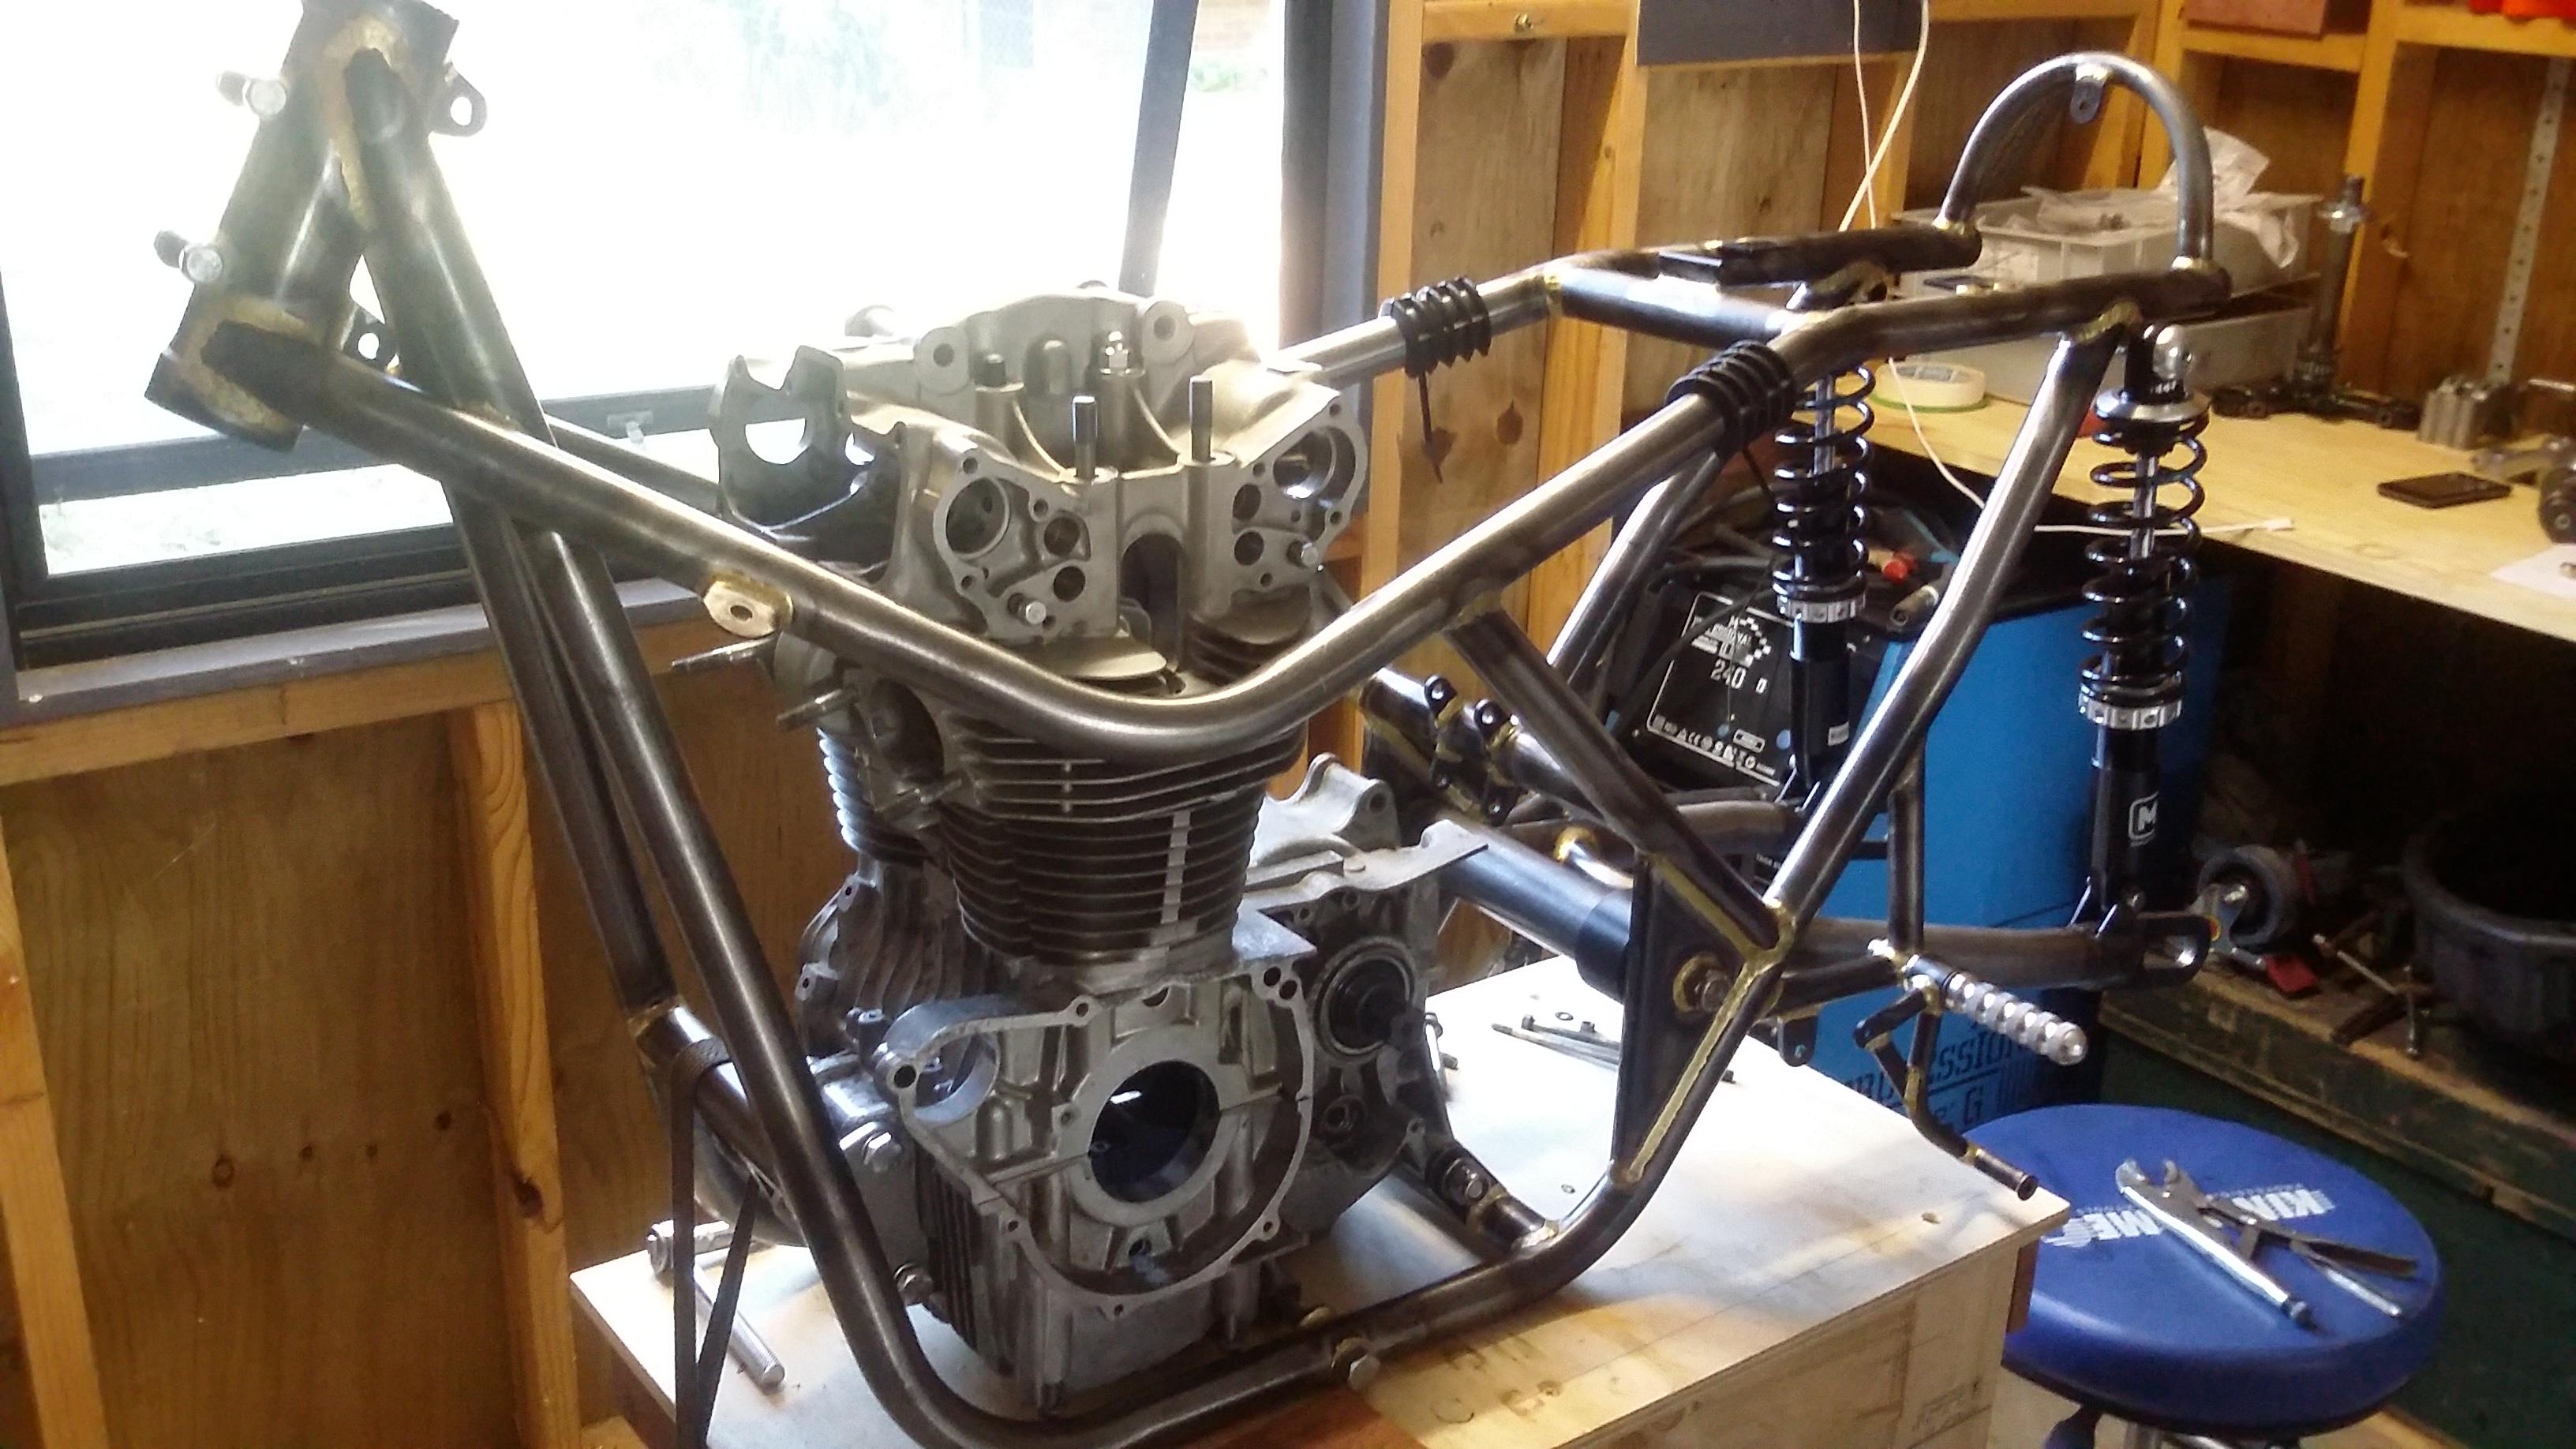 Drixton 500 twin build-20150322_163027.jpg